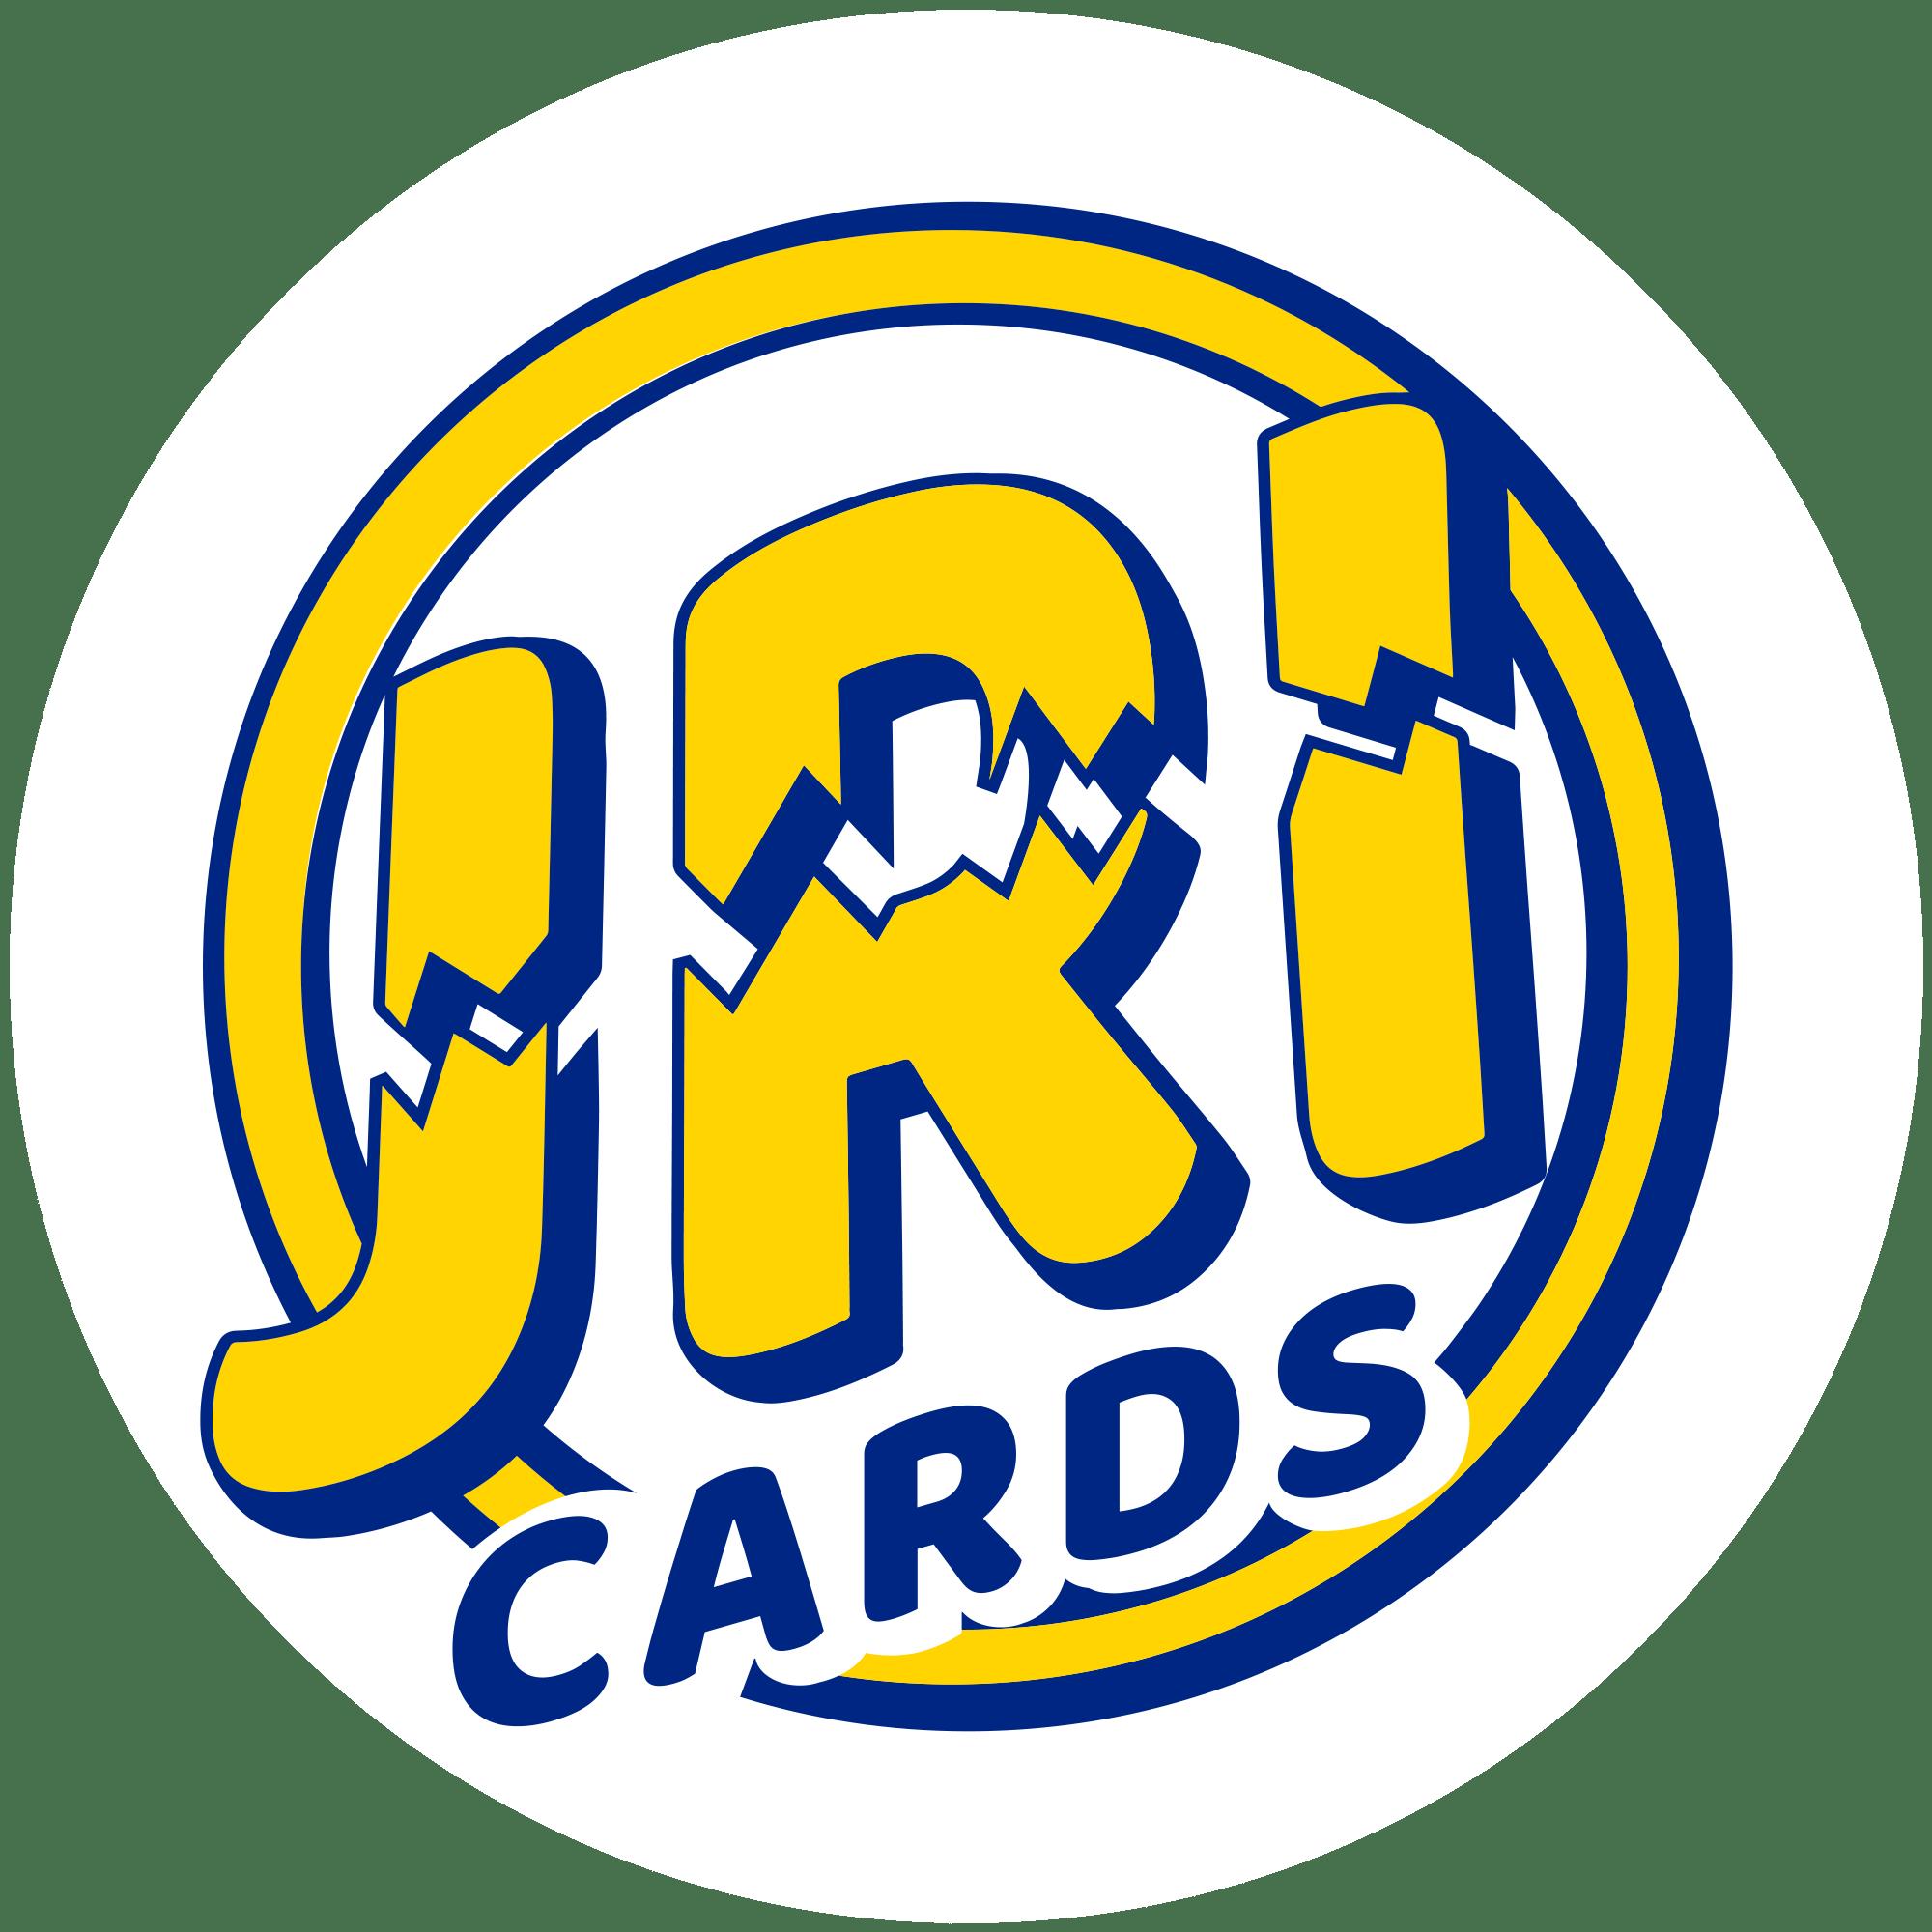 2020 PANINI CHRONICLES FOOTBALL BOX (6 PACKS AVAILABLE)